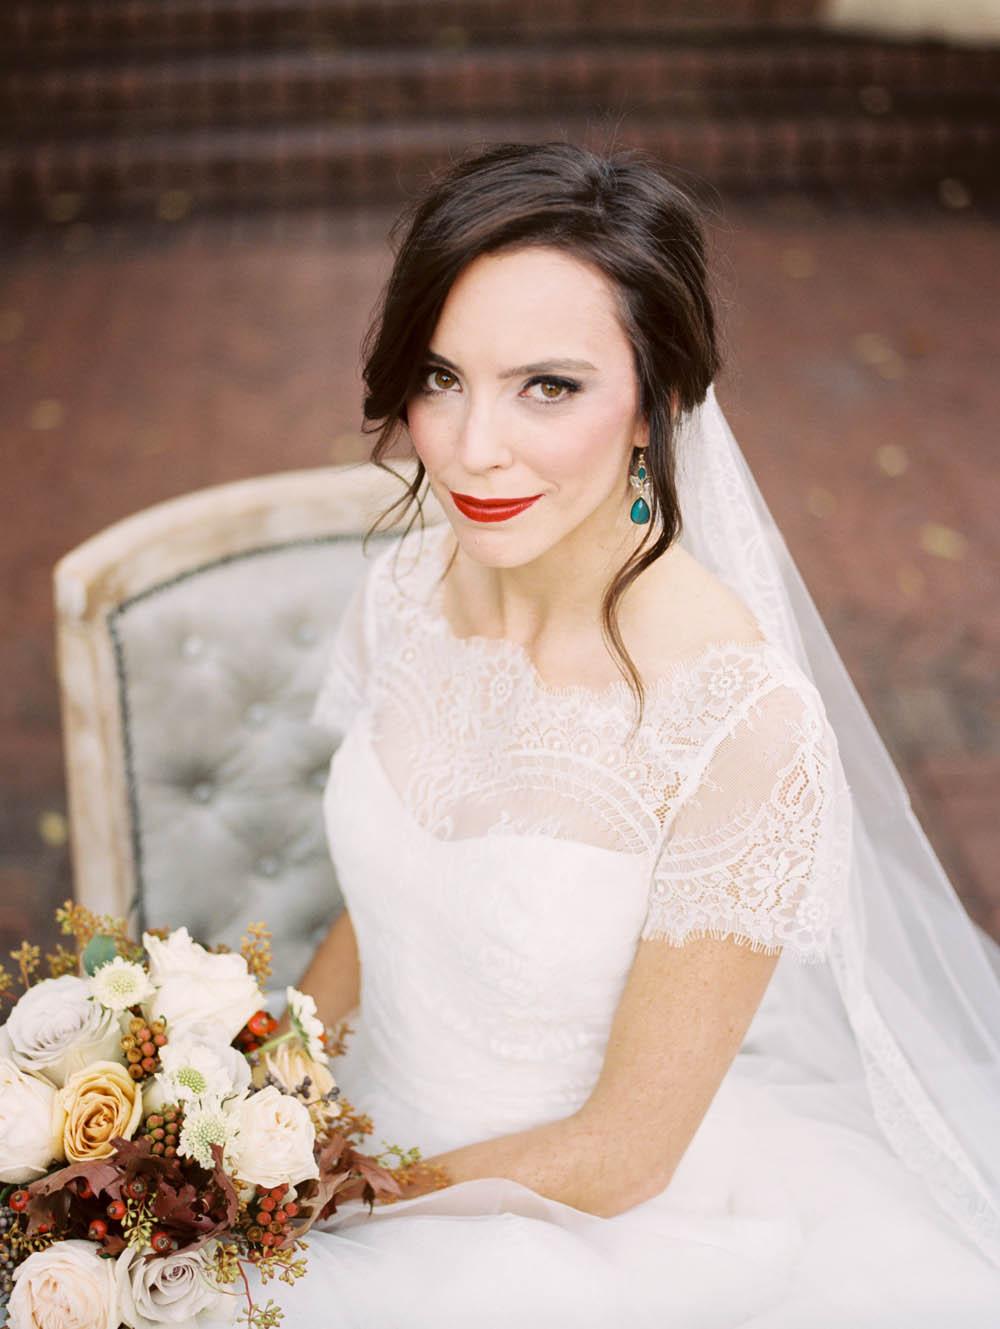 Cranberry and Deep Teal Wedding Inspiration